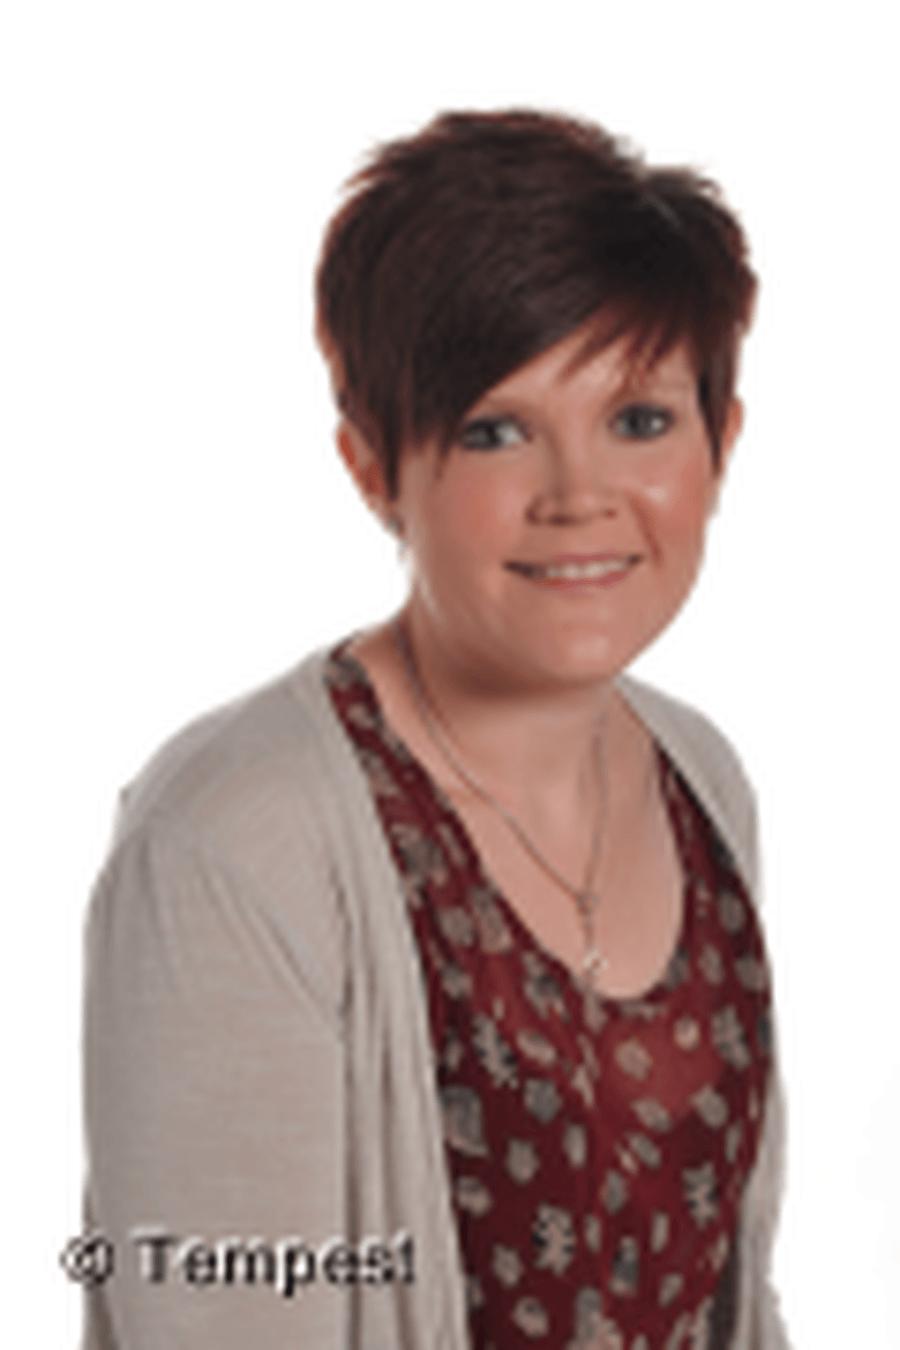 Miss A Tomley - Assistant Headteacher